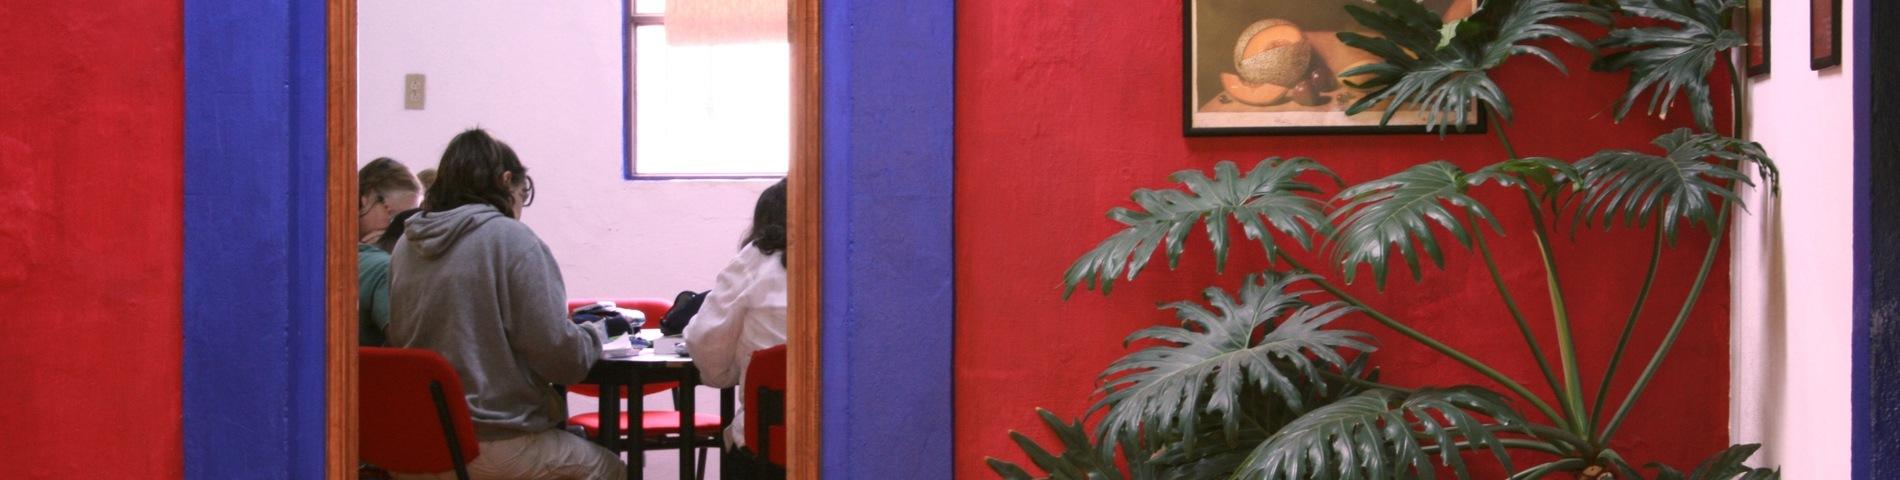 Imagen 1 de la escuela Don Quijote / Solexico Language & Cultural Centers